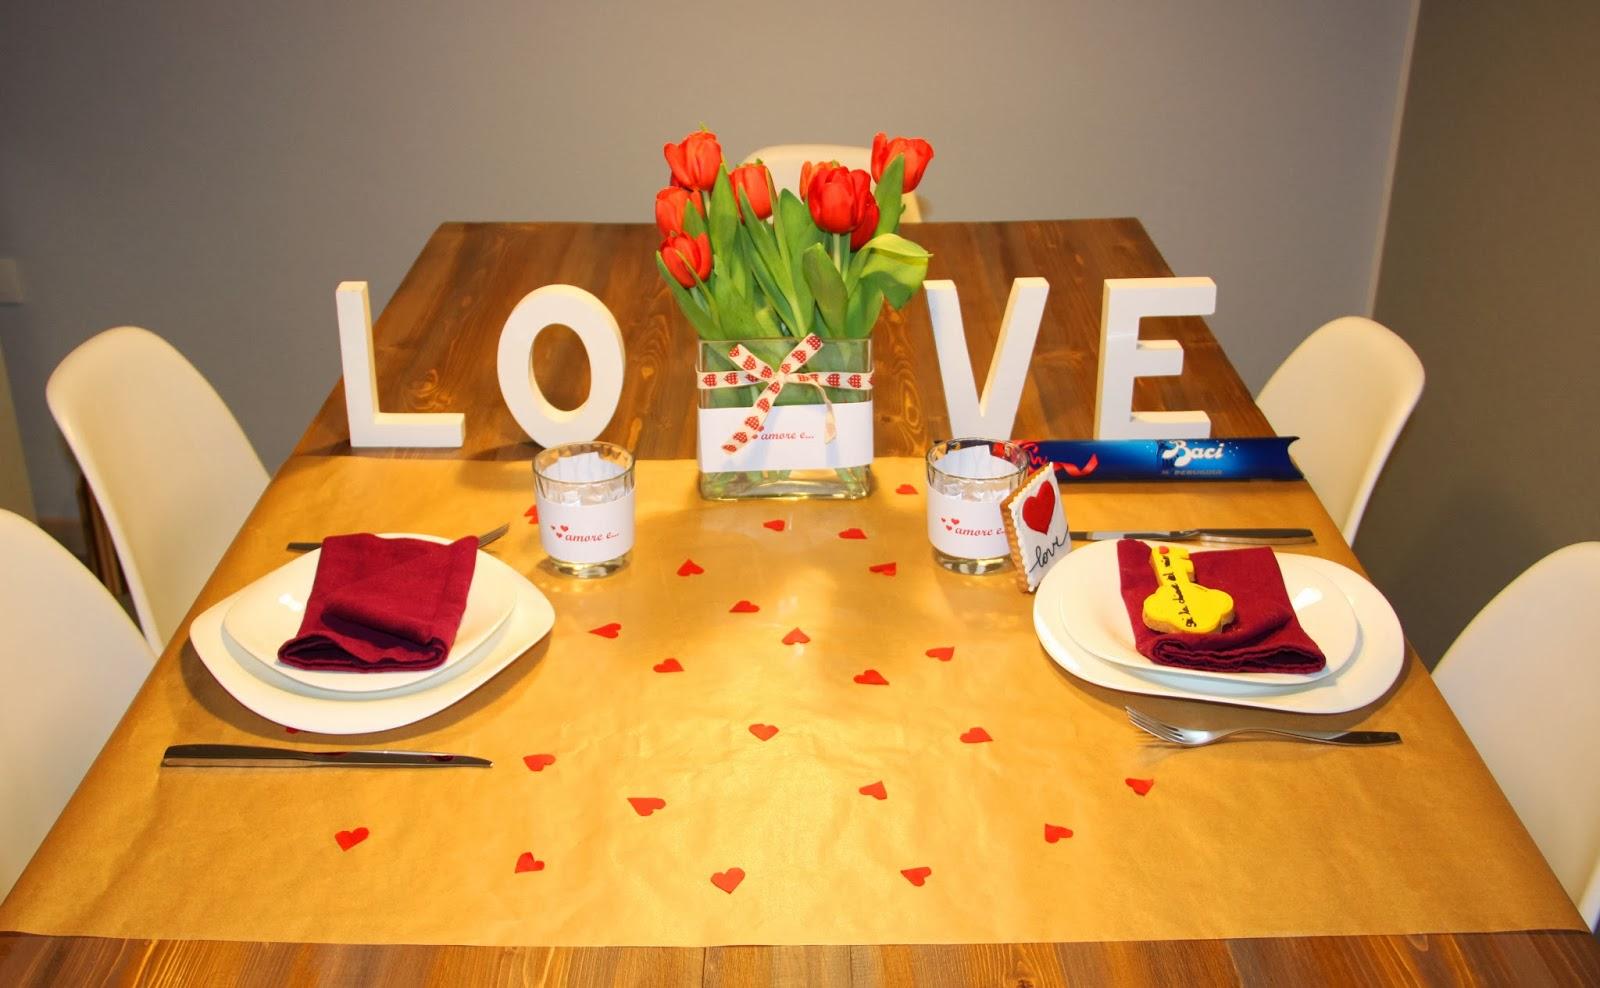 allestimento tavola cena romantica